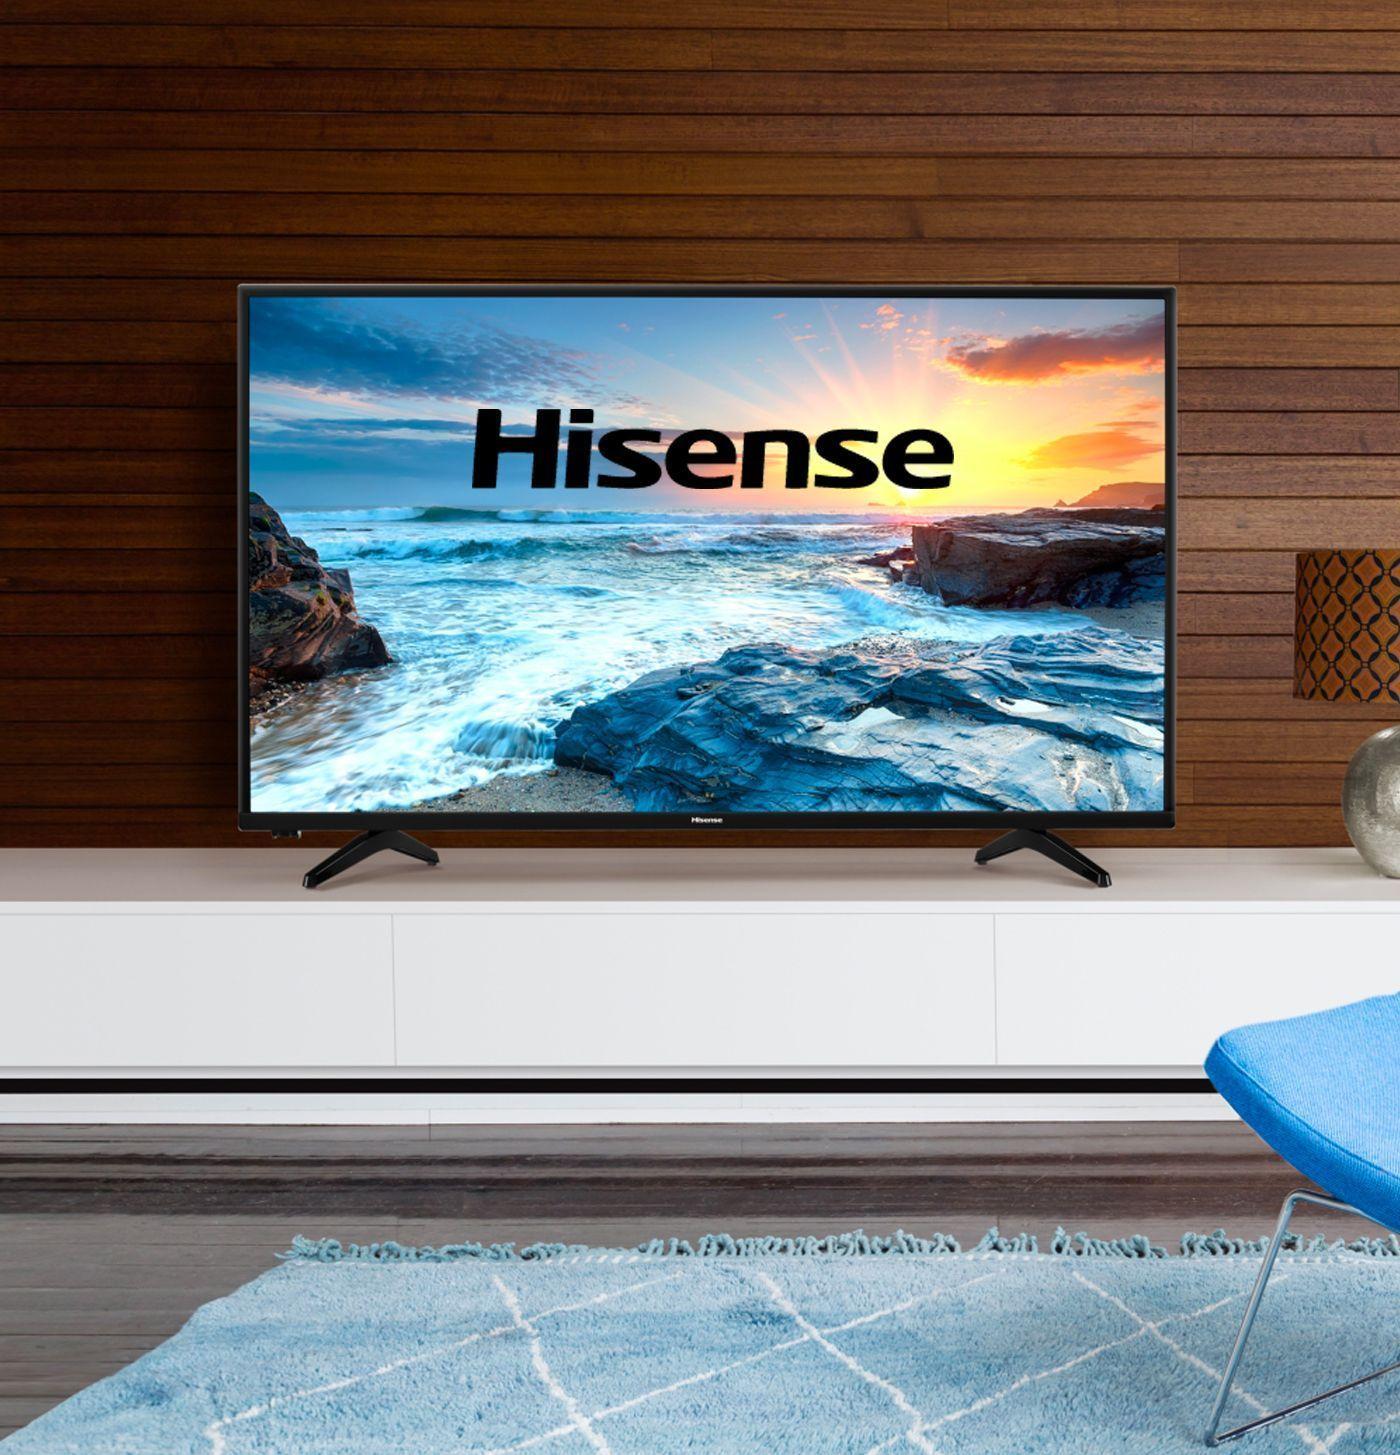 Hisense – En Casa con Hisense